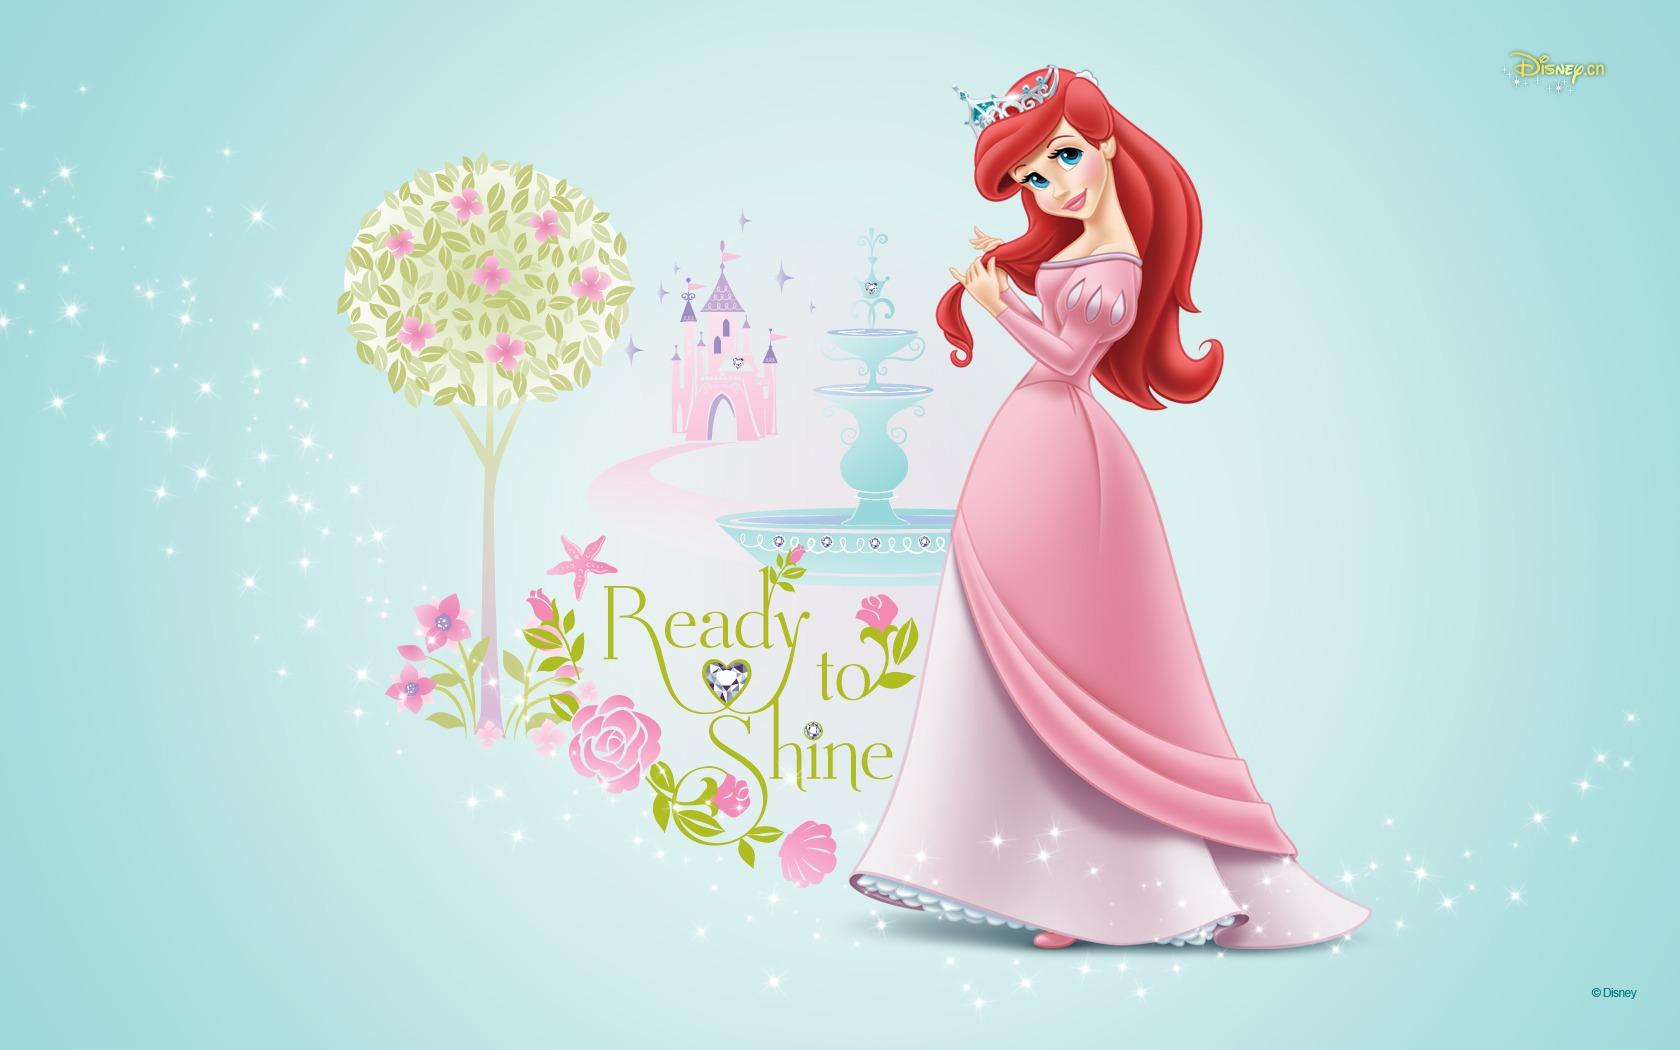 Disney Princess Wallpapers Disney cartoon wallpaper Anime Wallpaper 1680x1050